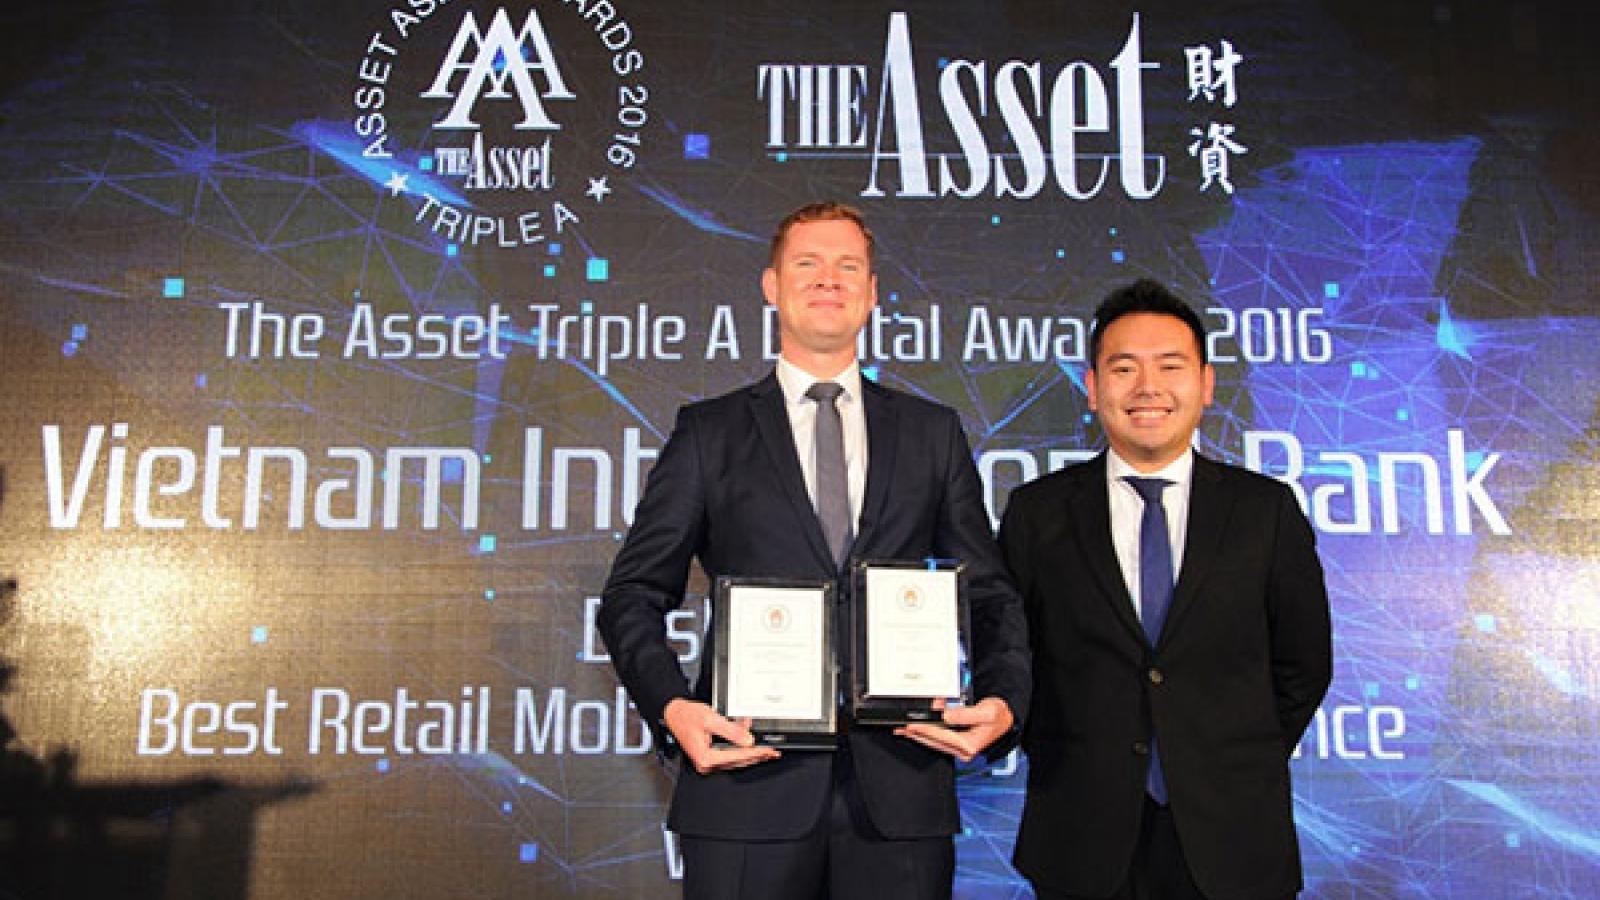 VIB wins international awards for MyVIB mobile banking app